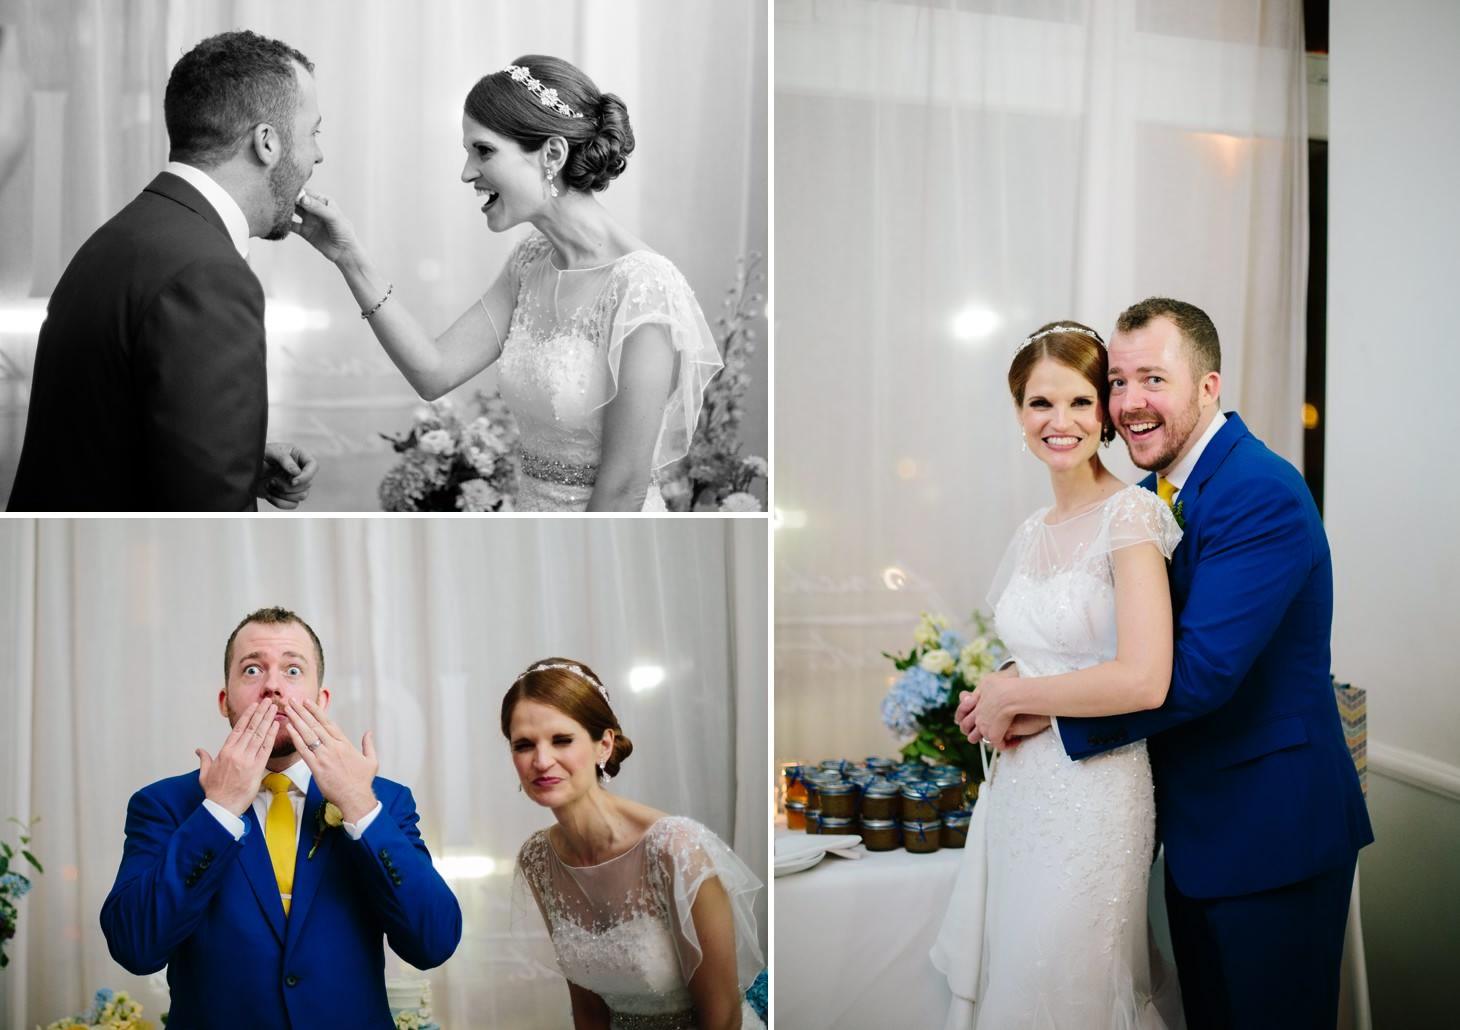 x-brooklyn-restaurant-wedding-nyc-weddingi-photographer-smitten-chickens188.jpg